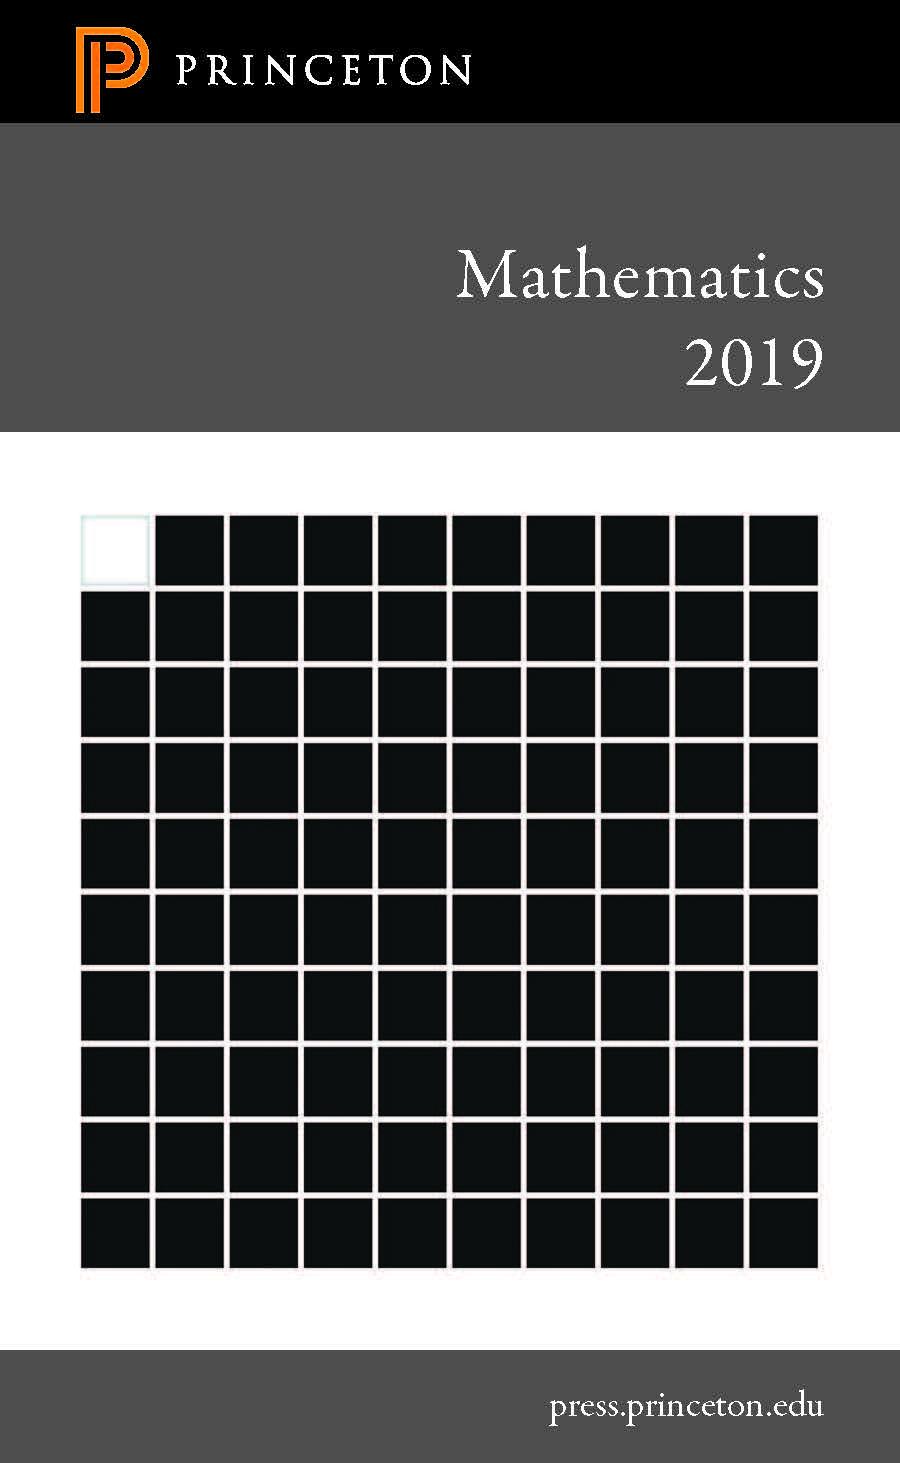 Mathematics 2019 Catalog